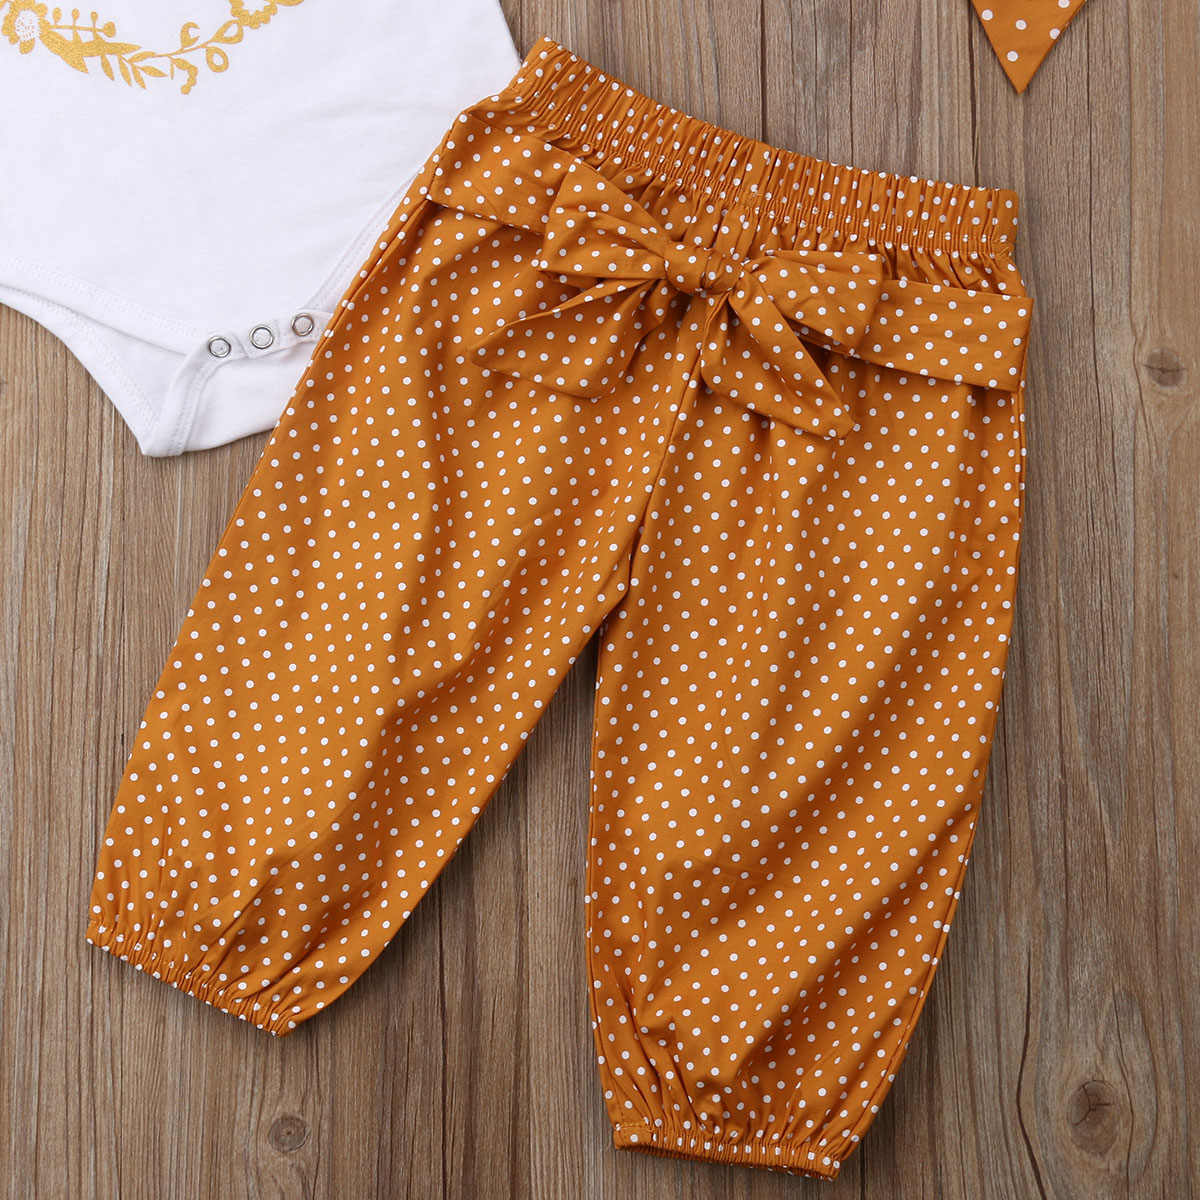 0-18M Neugeborenen Baby Junge Mädchen Kurzarm Baumwolle Body Tops Dot Lange Hose Hosen Stirnband 3PCS outfits Sommer Kleidung Set